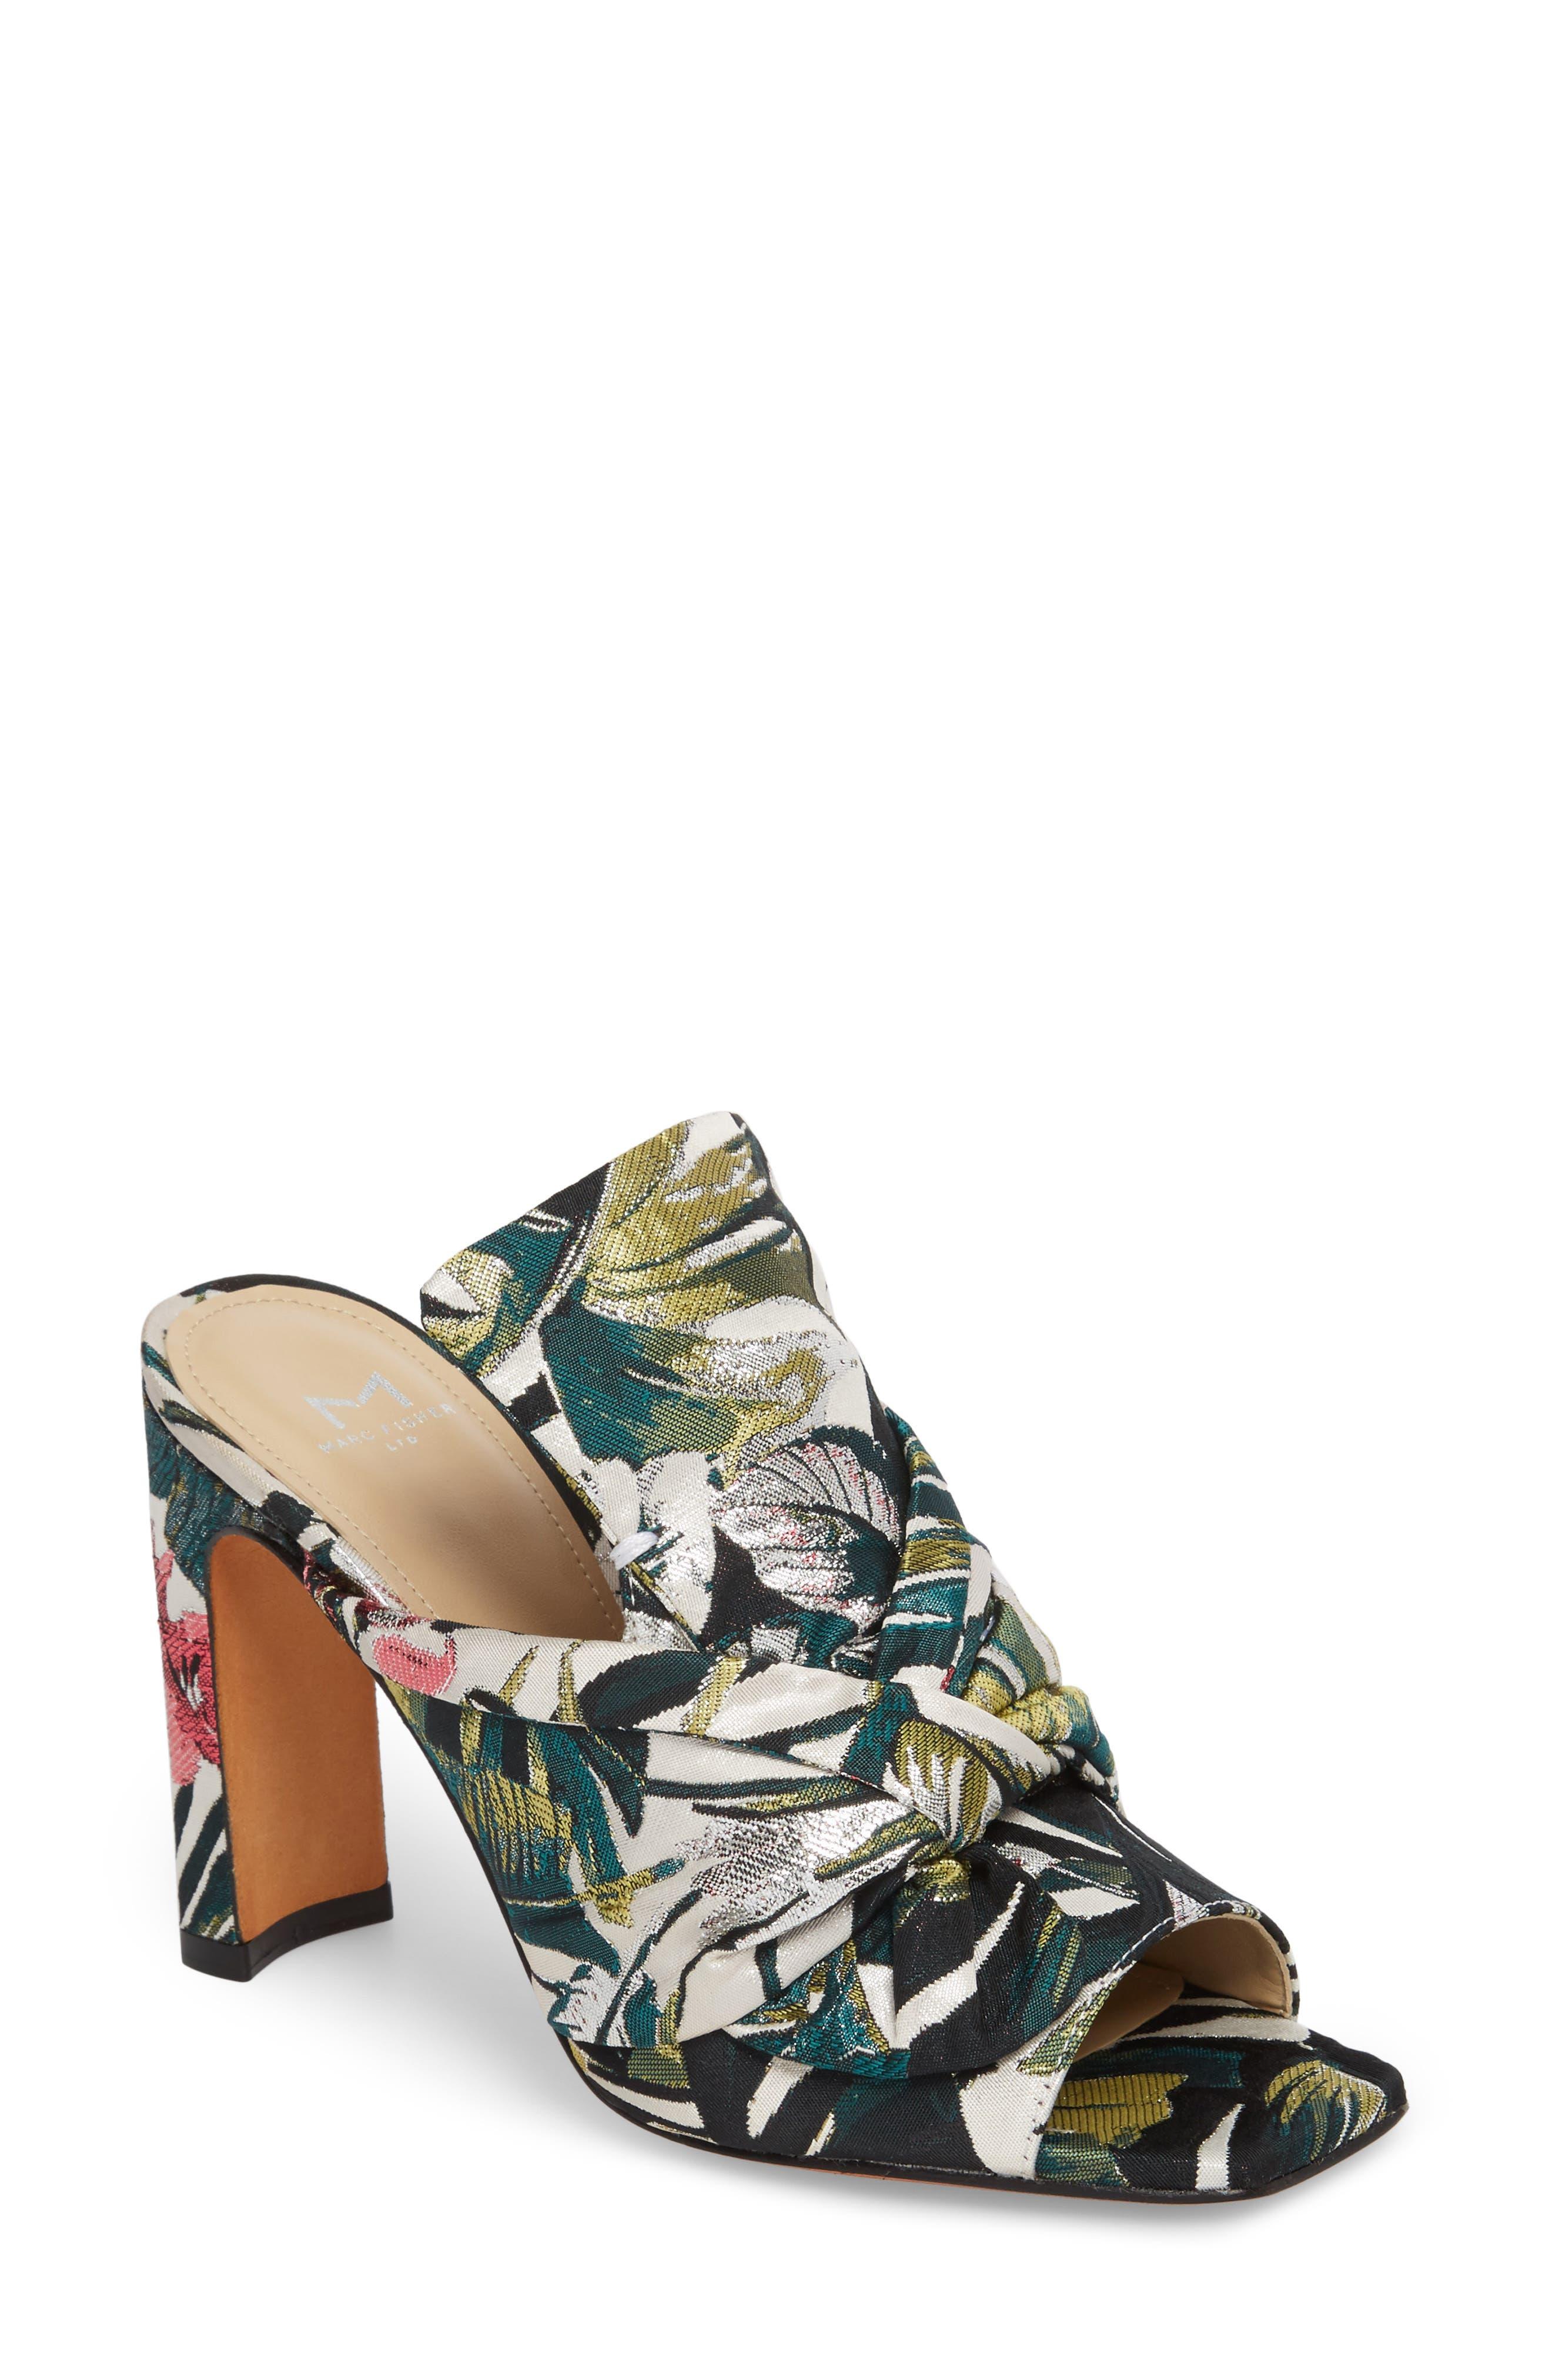 Hogan Slide Sandal,                             Main thumbnail 1, color,                             White Leather